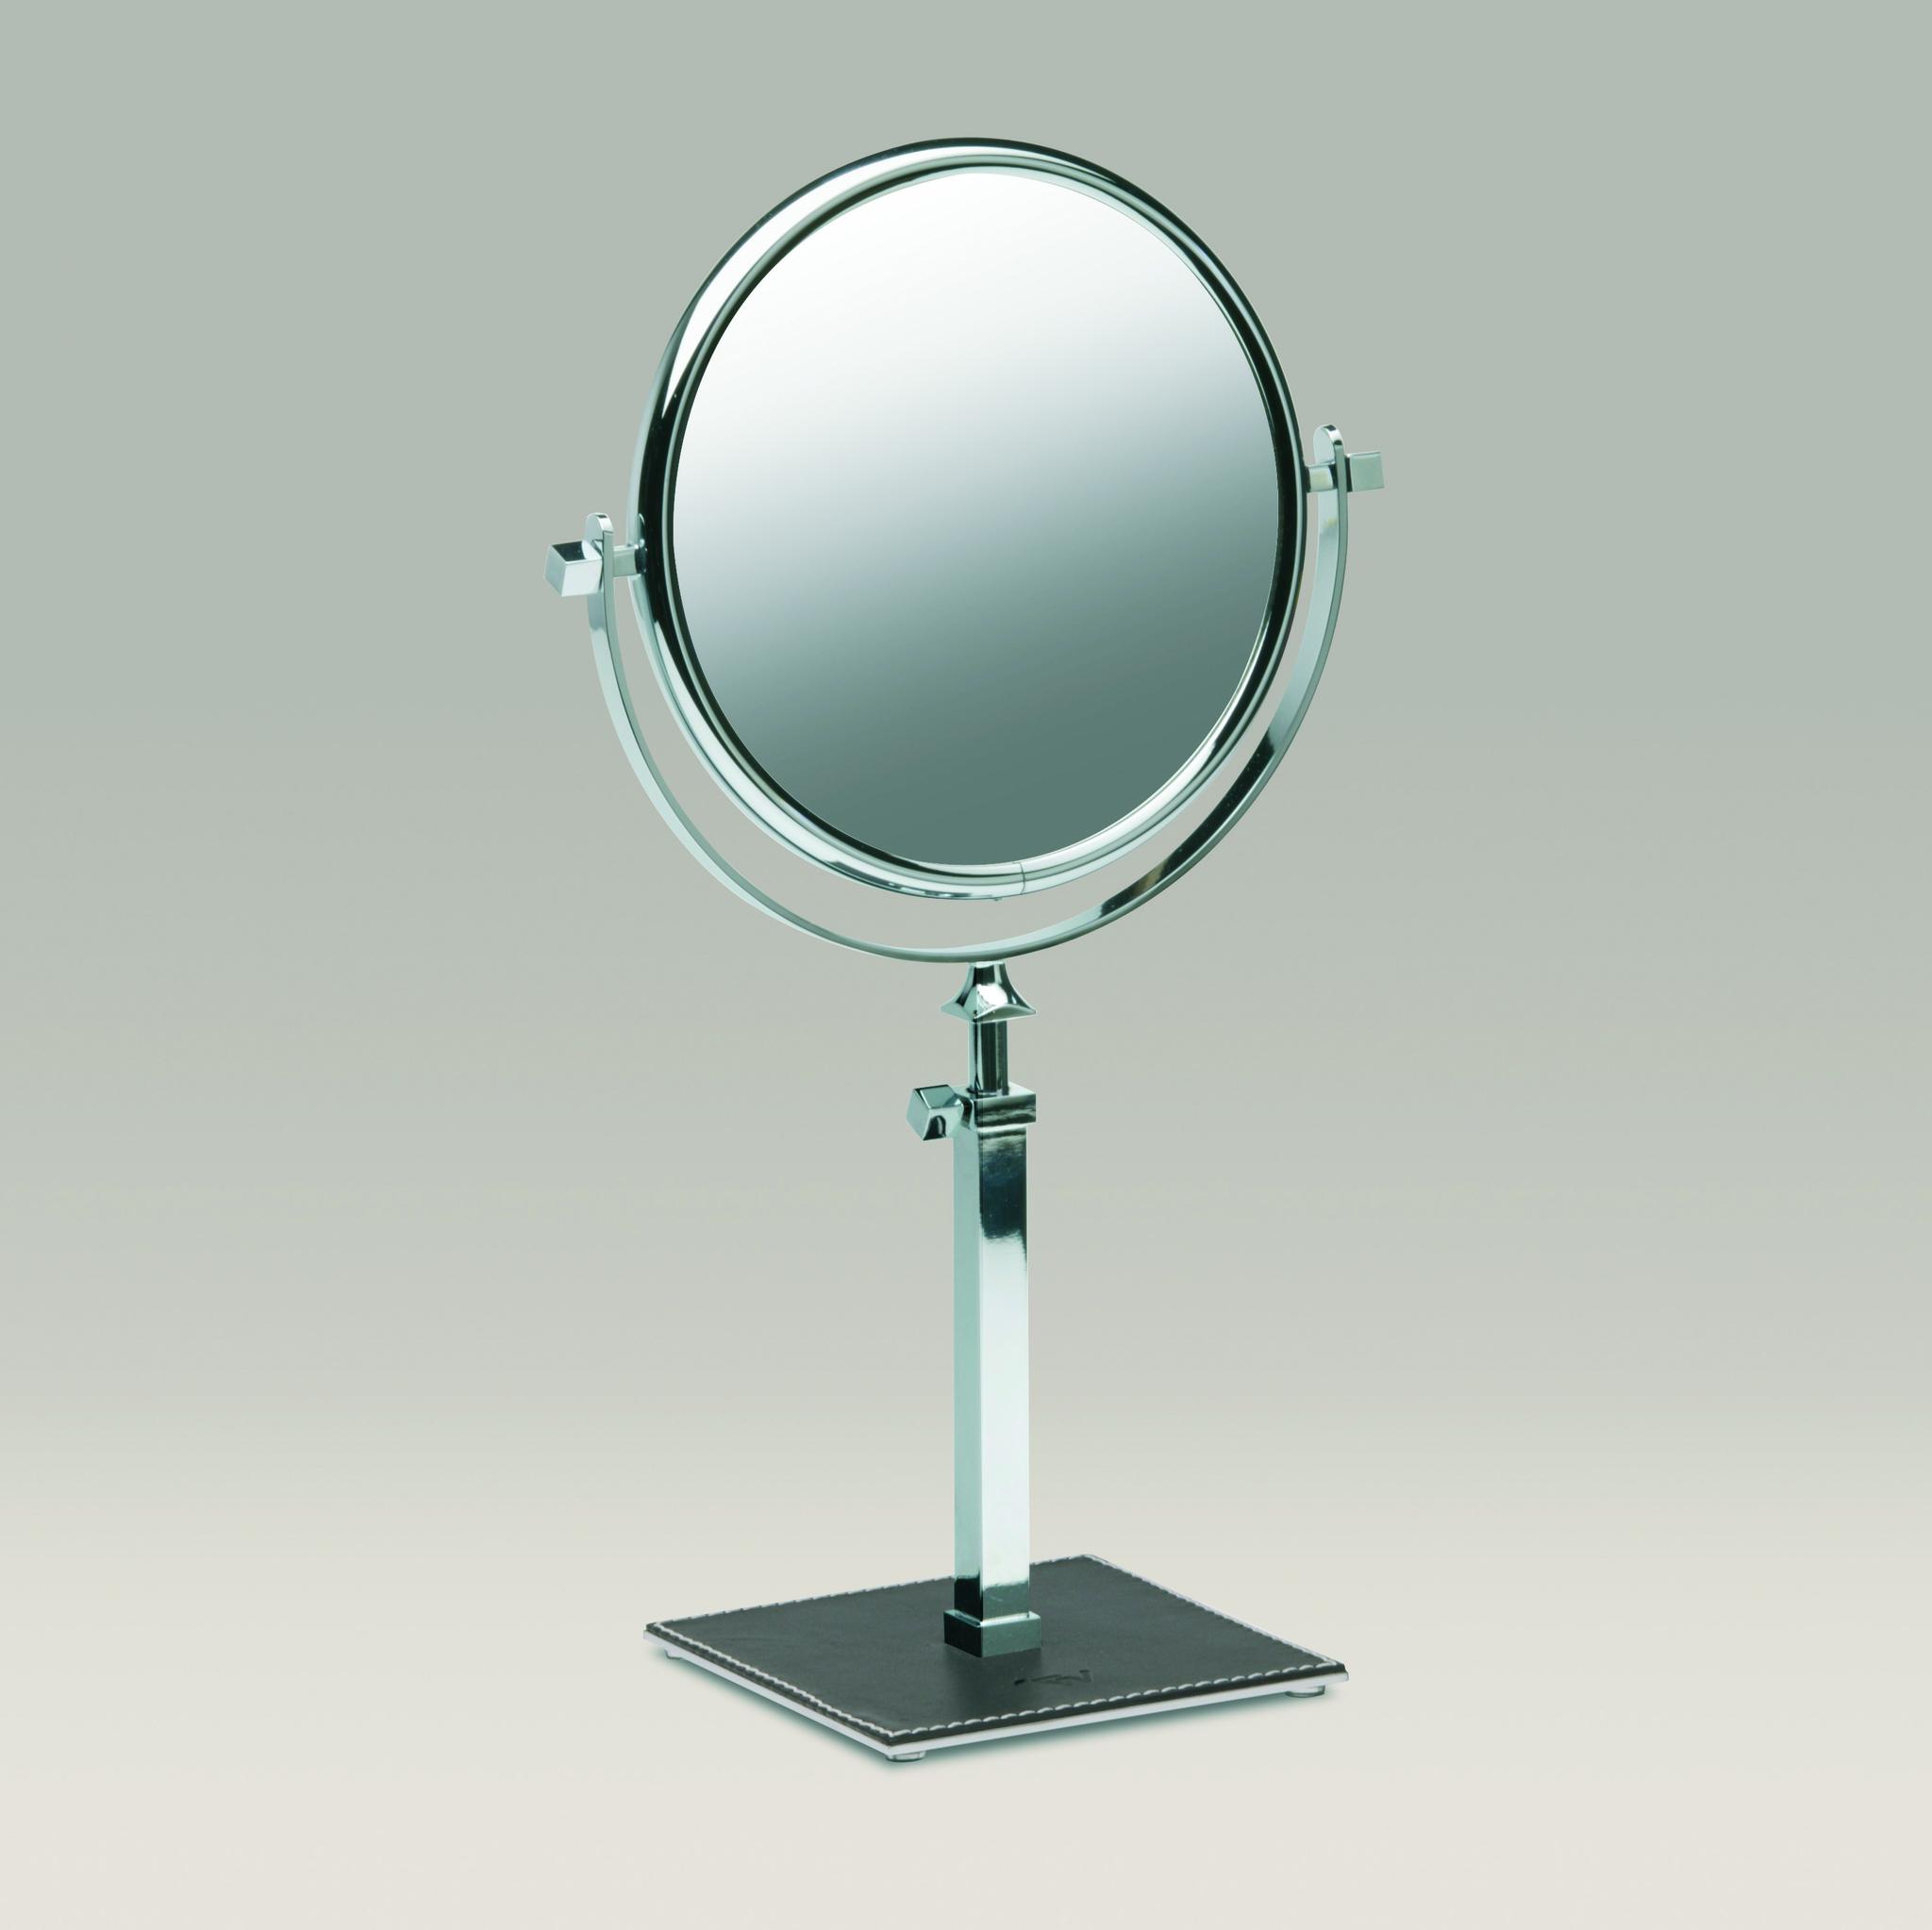 Зеркала Зеркало косметическое Windisch 99135R 5XOP Kenia elitnoe-zerkalo-kosmeticheskoe-99135-kenia-ot-windisch-ispaniya.jpg